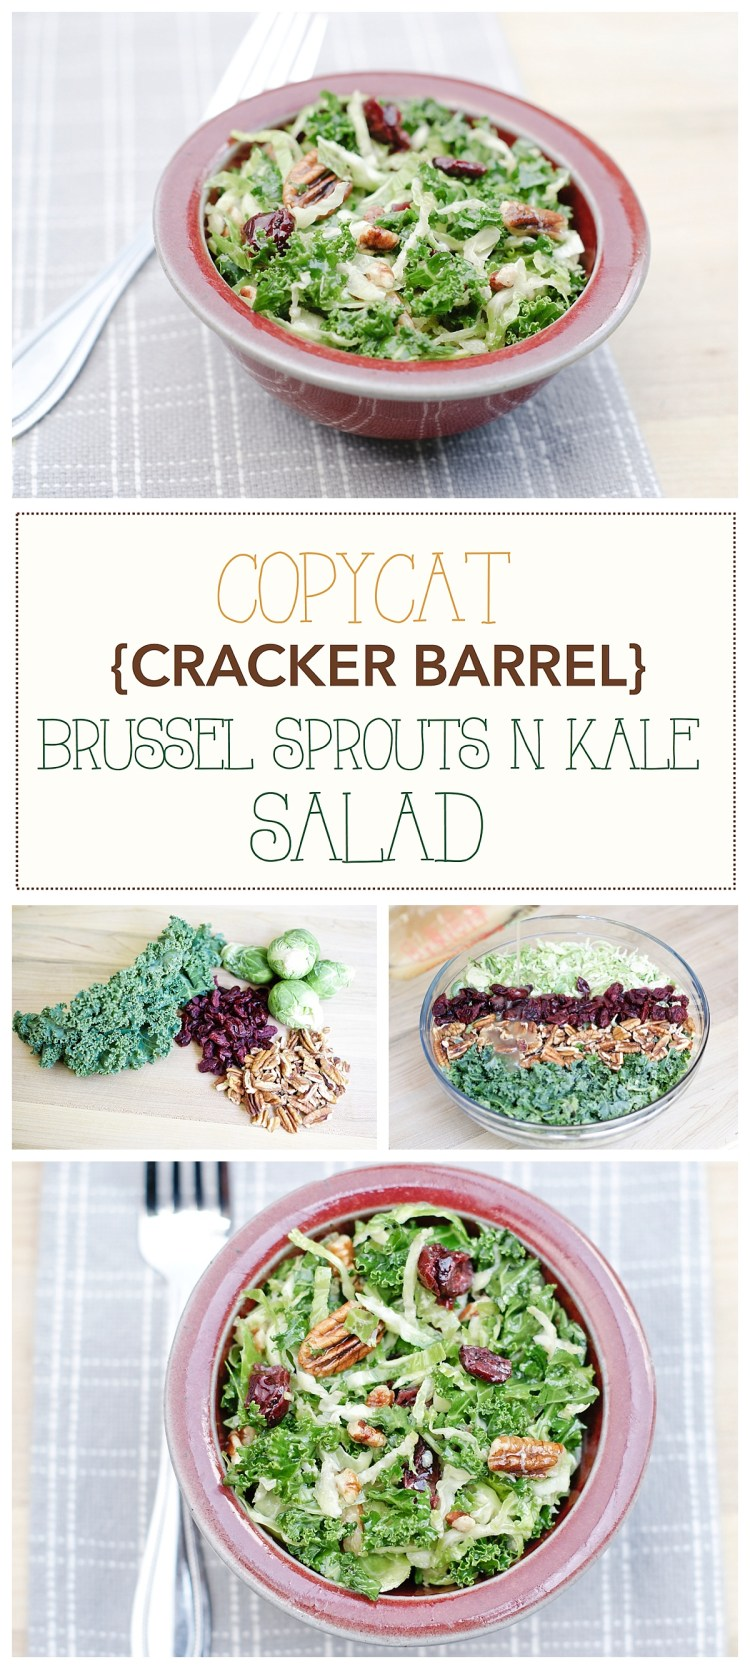 Cracker Barrel Copycat Brussel Sprouts n Kale Salad Recipe | Vegan Healthy Salad | Gluten free | Pecans Craisins Salad | Maple Vinaigrette Recipe | Healthy Meal Ideas | Healthy Recipes | Spring Summer Salads | Copycat Recipes | Six Clever Sisters